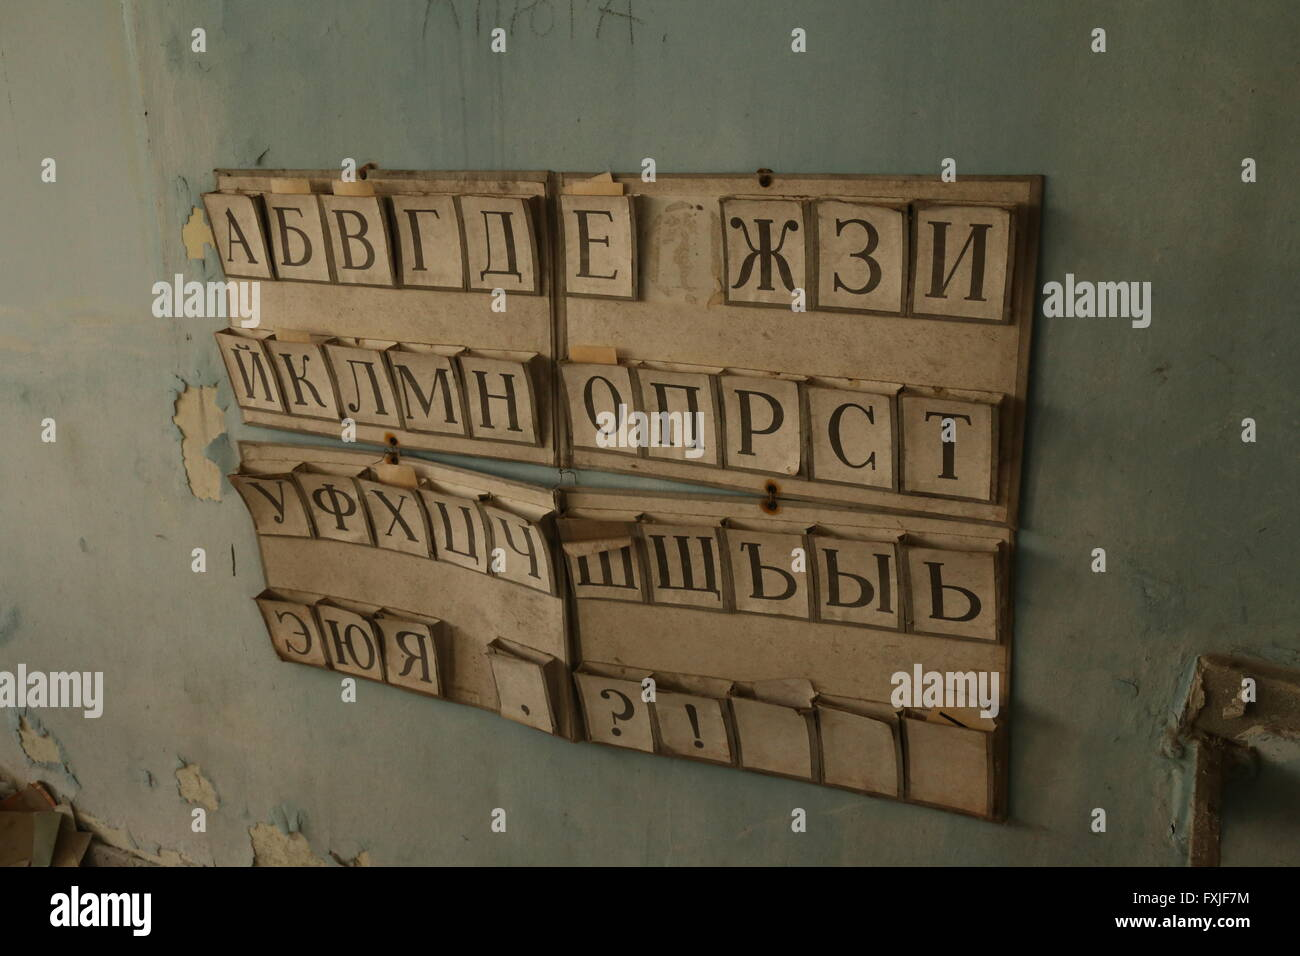 School in the abandoned city of Pripyat, Chernobyl Exclusion Zone, Ukraine - Stock Image